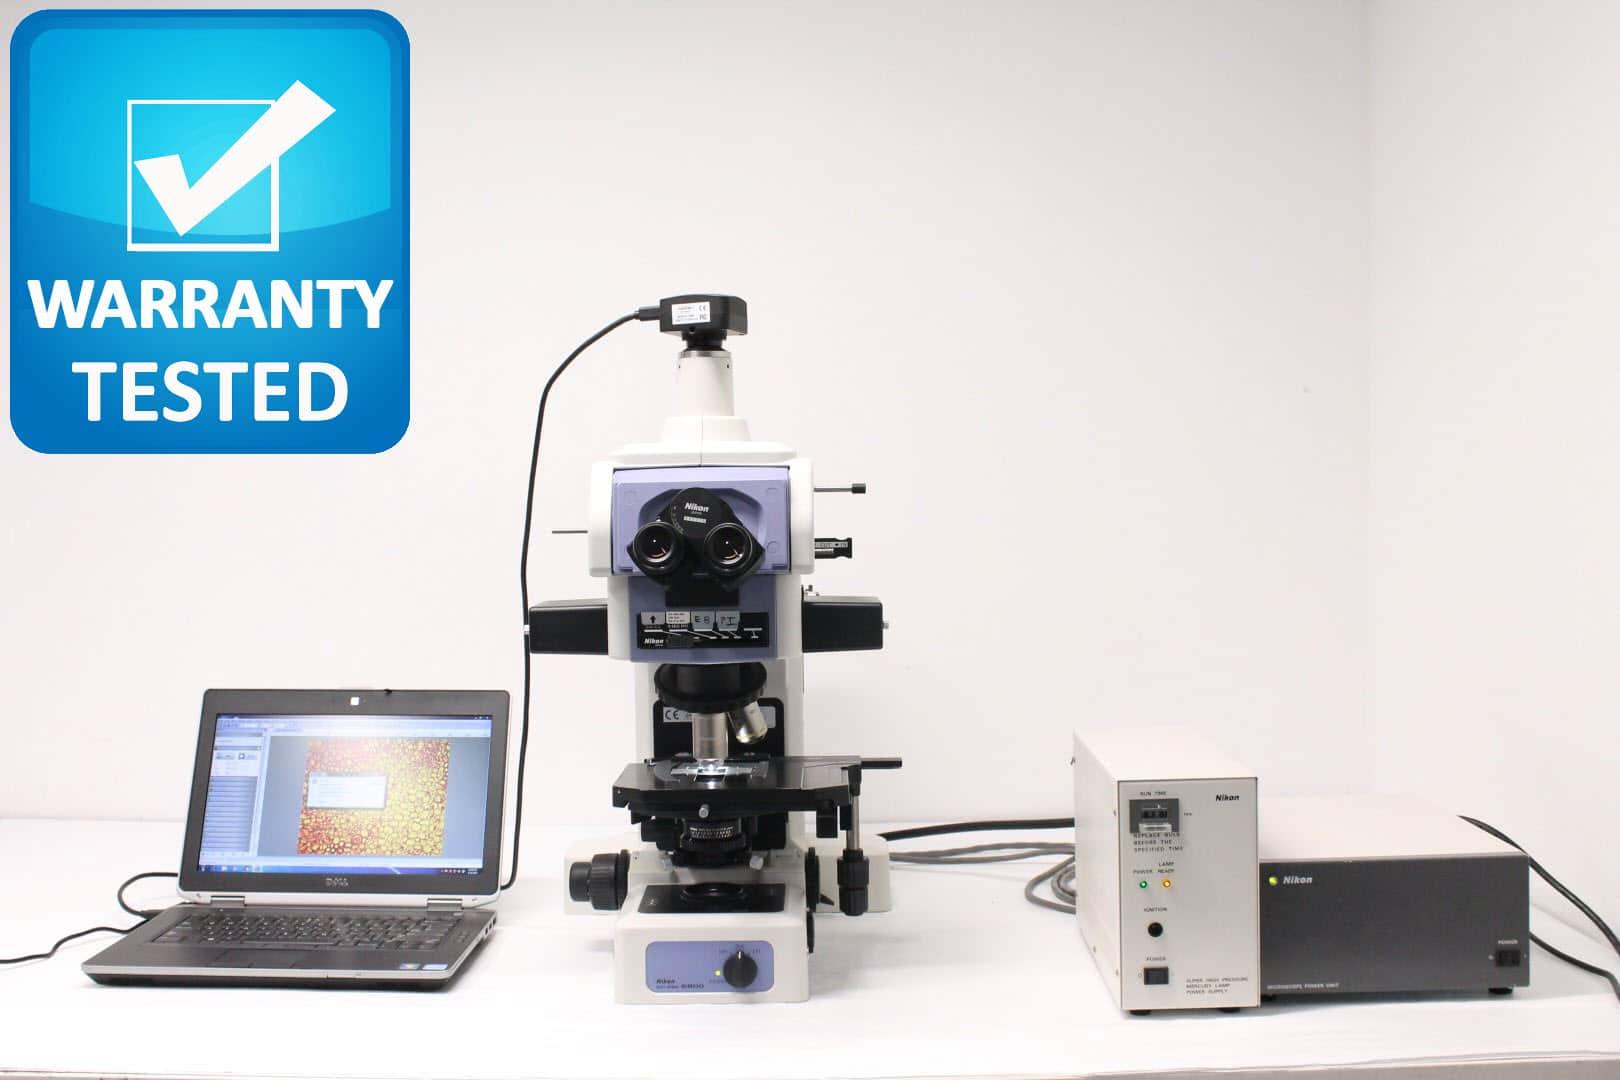 Nikon E800 Fluorescence Microscope